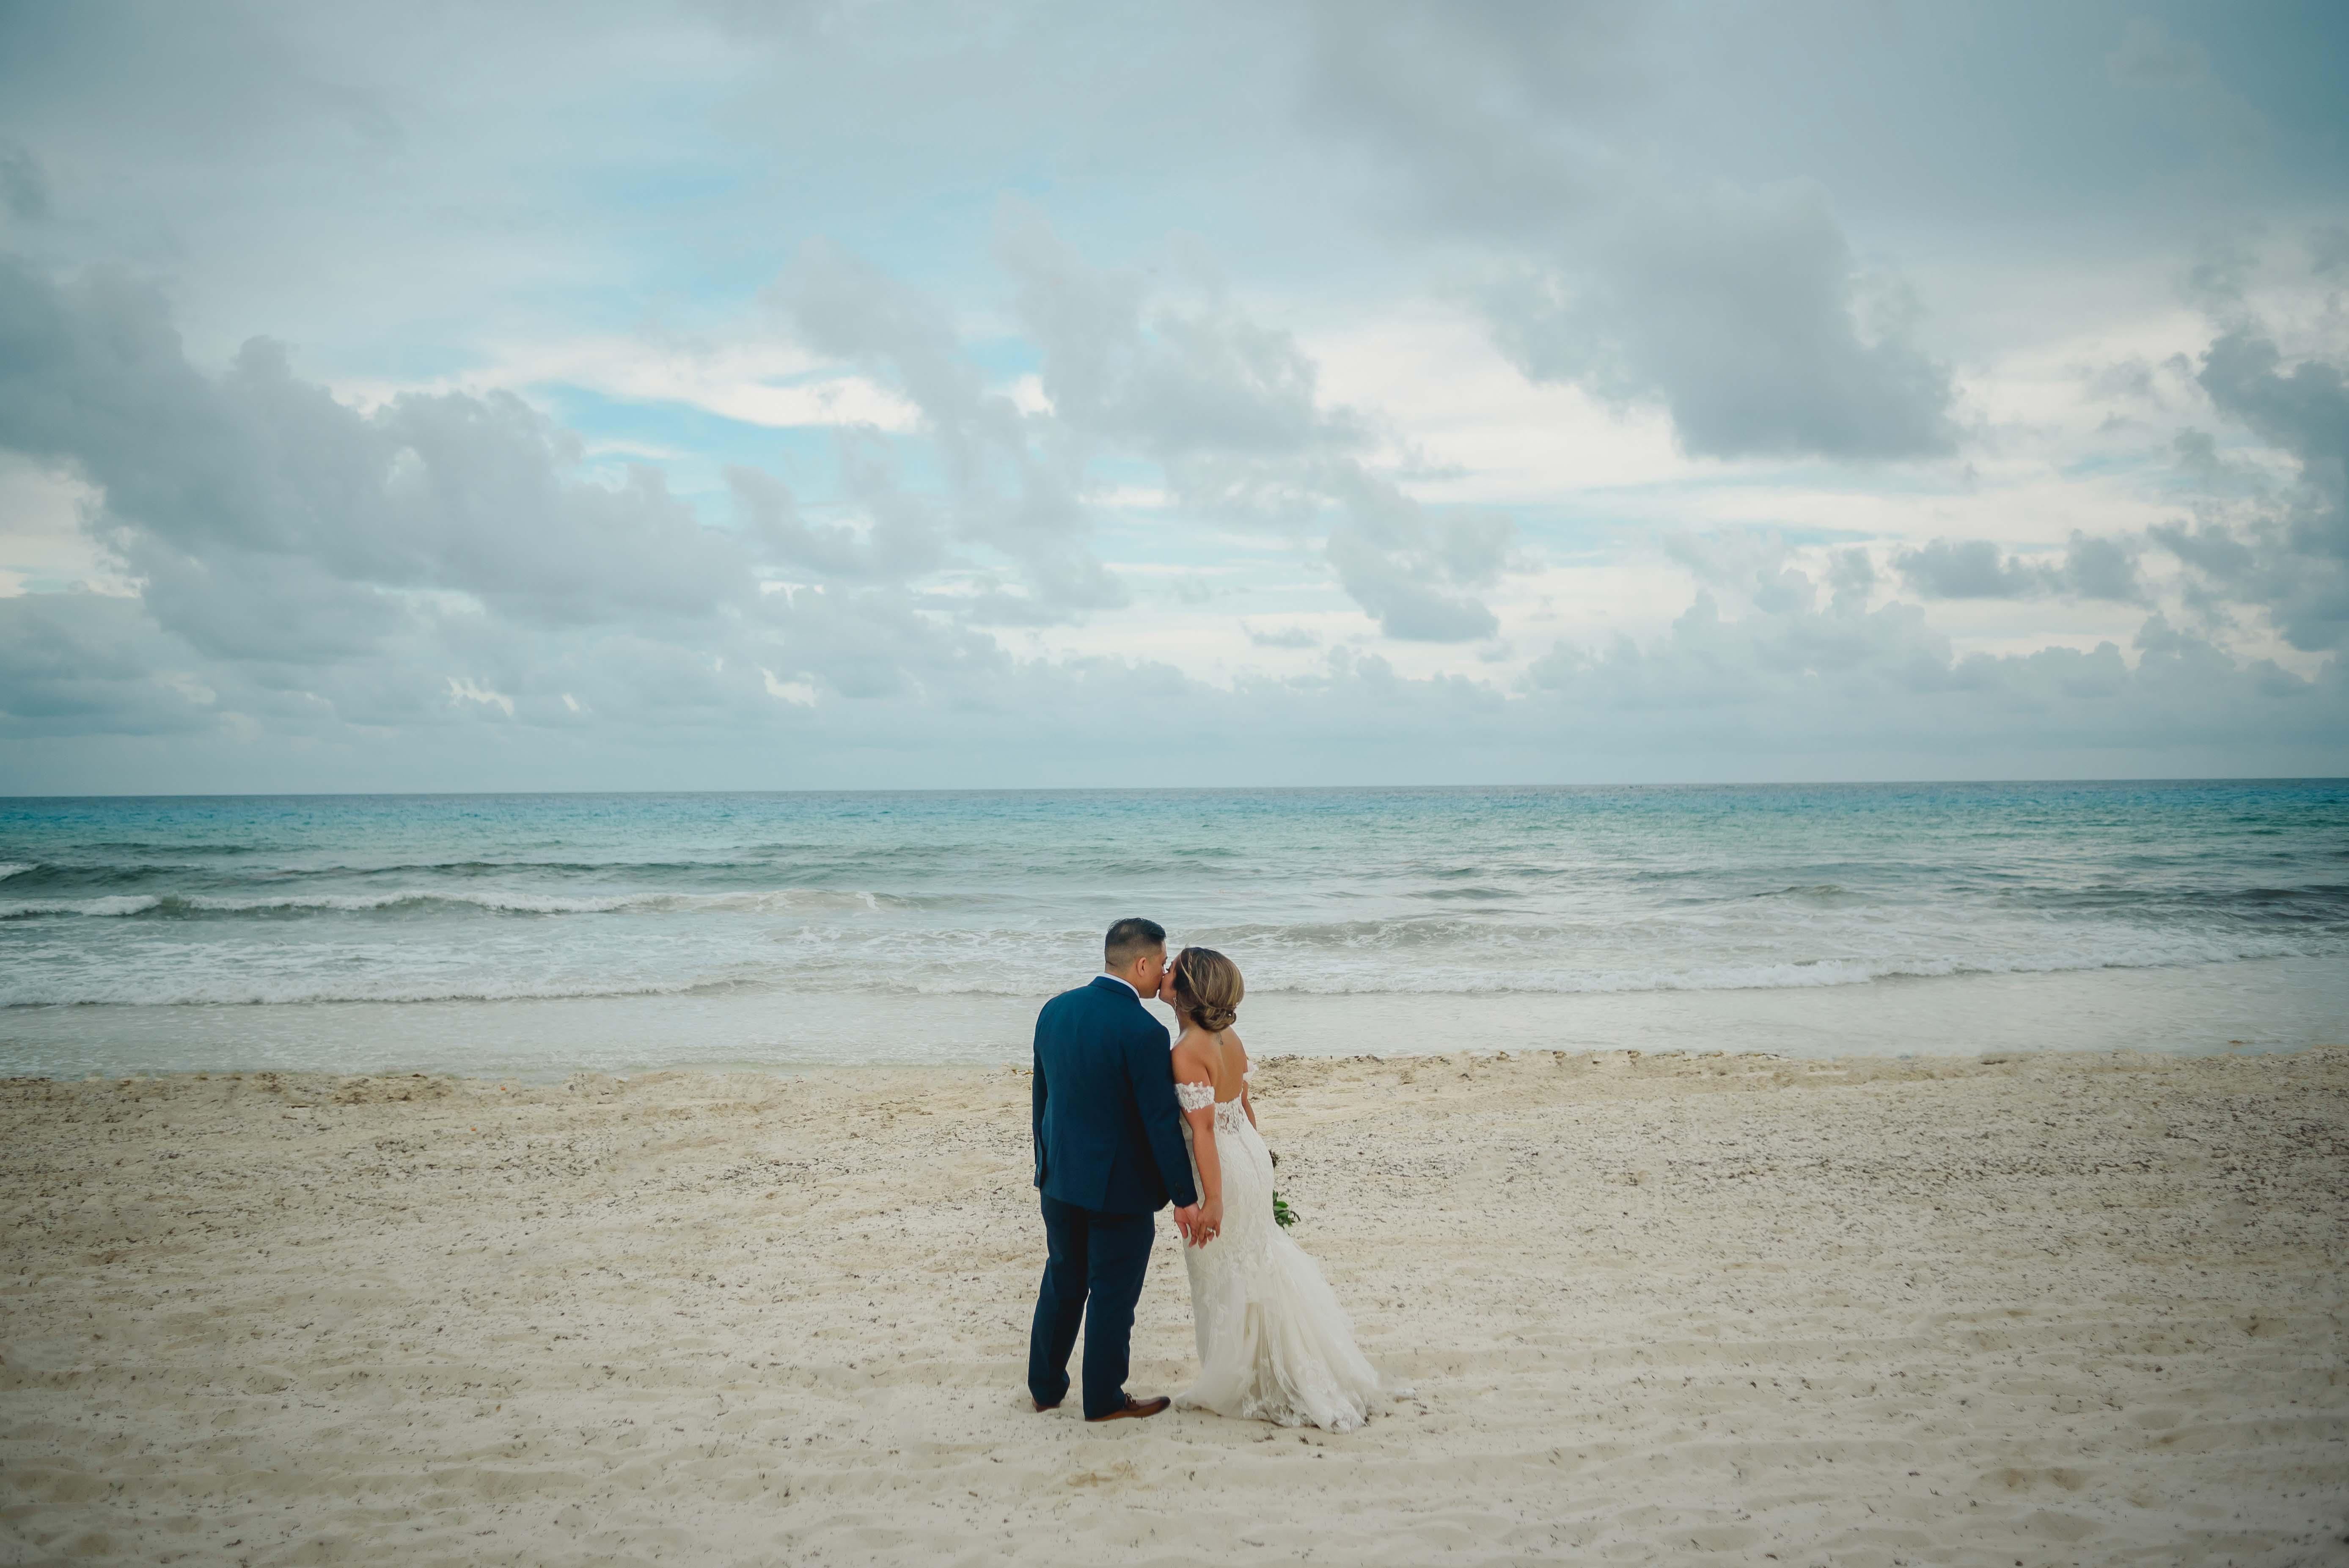 Kat Yen + Kevin | Cancún, Mexico | Panama Jack Resorts Cancun